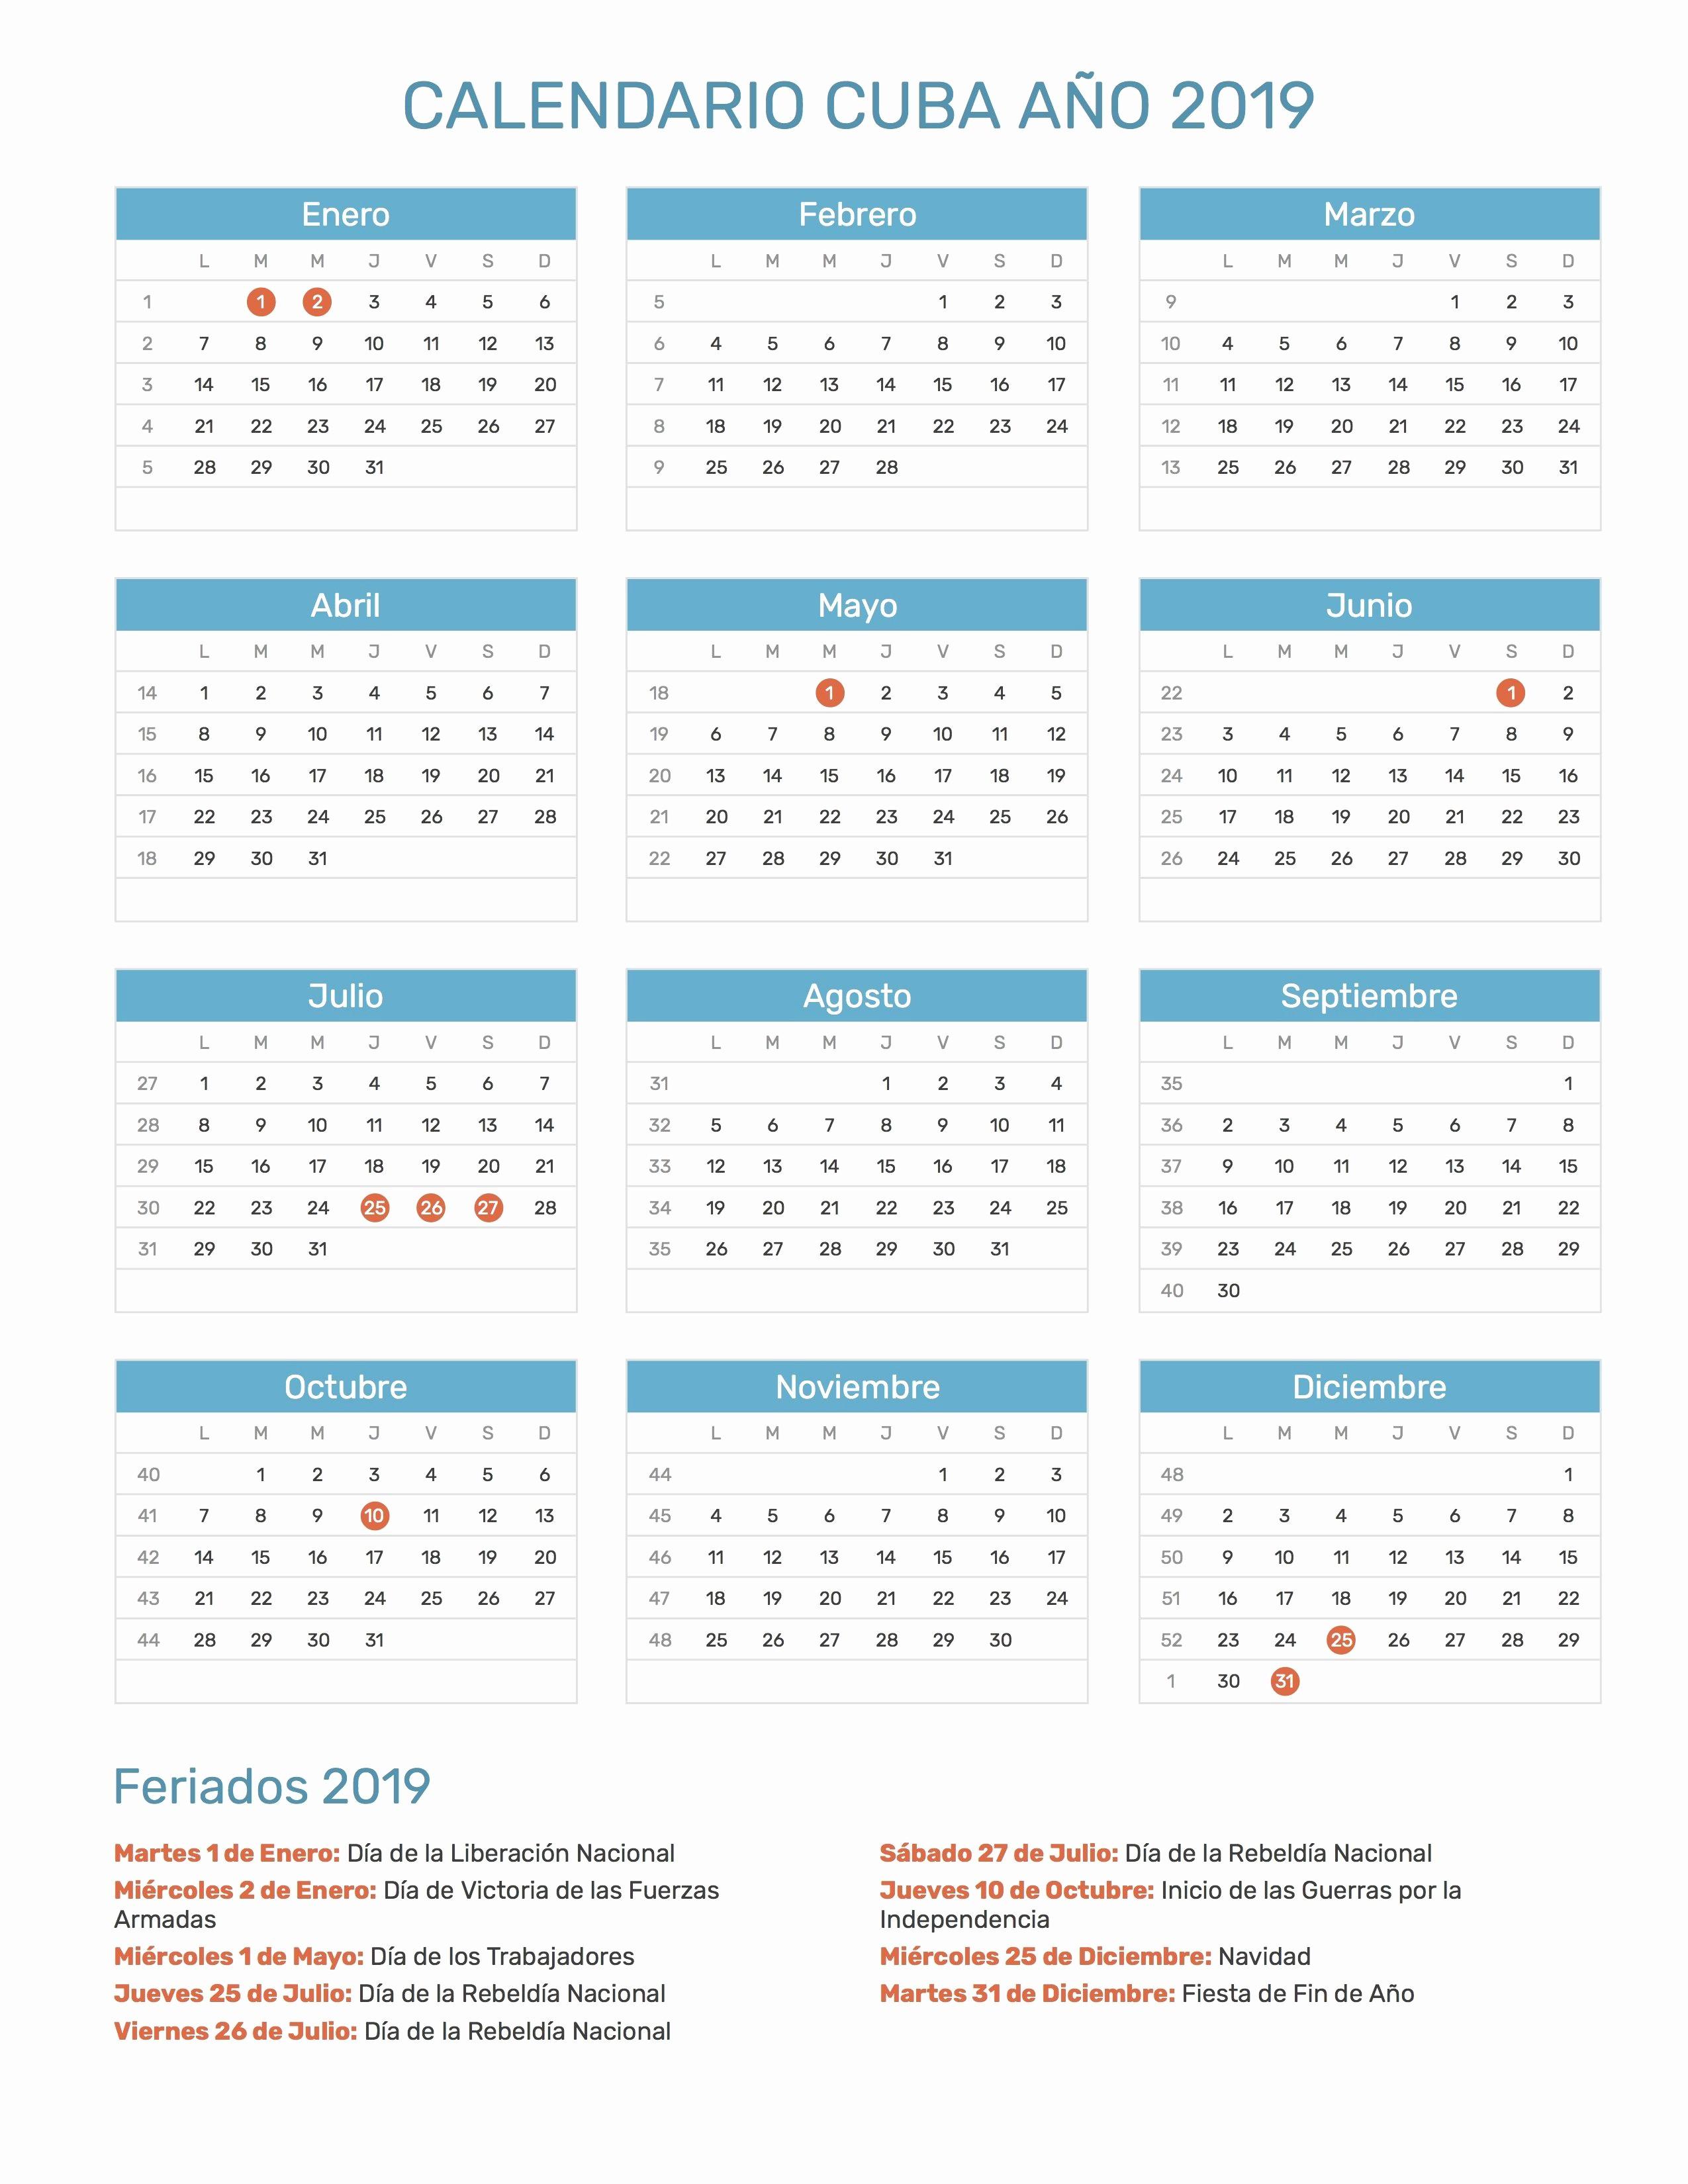 Calendario De Dividendos Telefonica 2019 Calendario De Cuba Con Feriados Nacionales Ano 2019